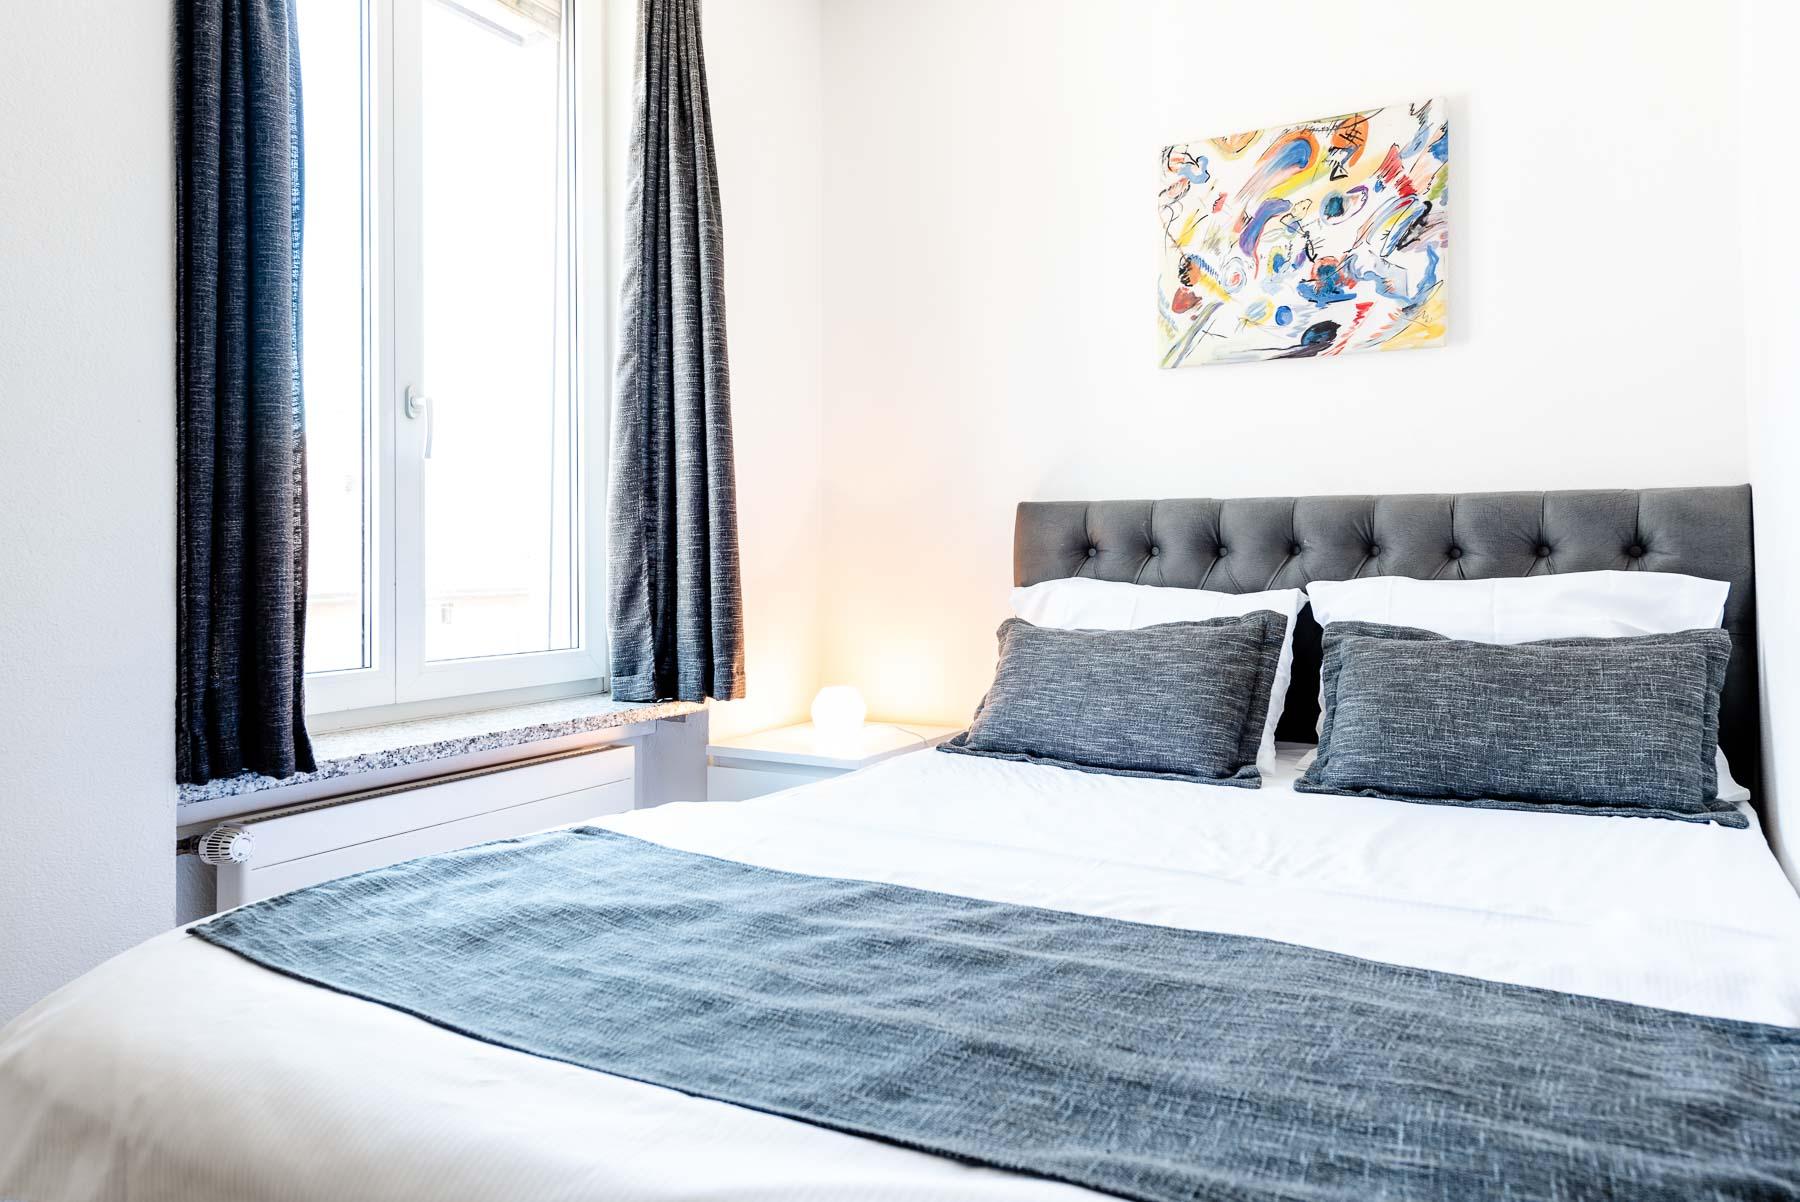 Full Size of Kingsize Bett Standard Studio Mit Iq130hotel Kinder Betten Bettkasten Günstig Kaufen Schramm 180x200 Komplett Lattenrost Und Matratze Weißes Massiv Bette Bett Kingsize Bett